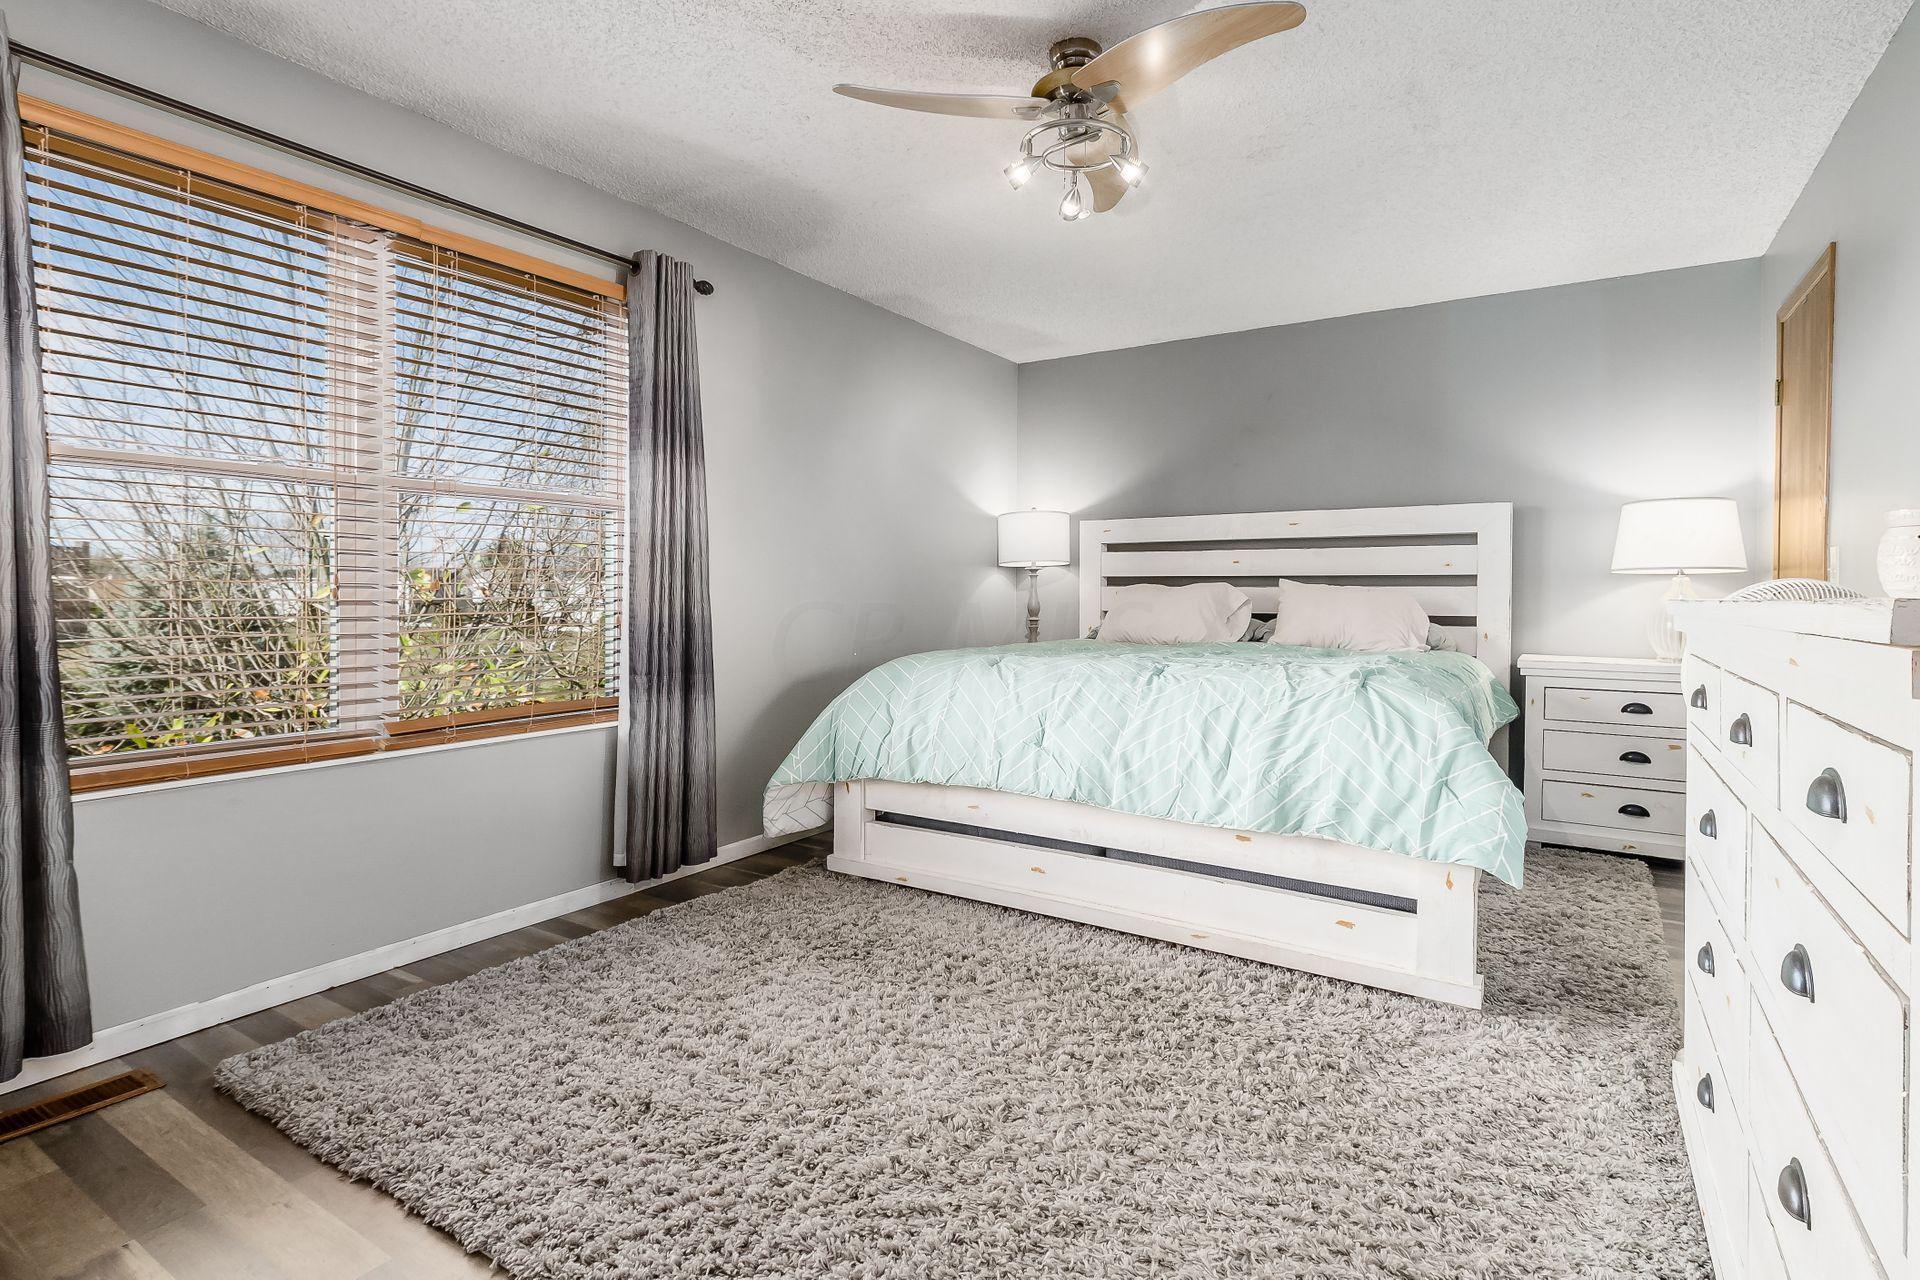 5294 Granite Drive, Hilliard, Ohio 43026, 3 Bedrooms Bedrooms, ,2 BathroomsBathrooms,Residential,For Sale,Granite,220041015